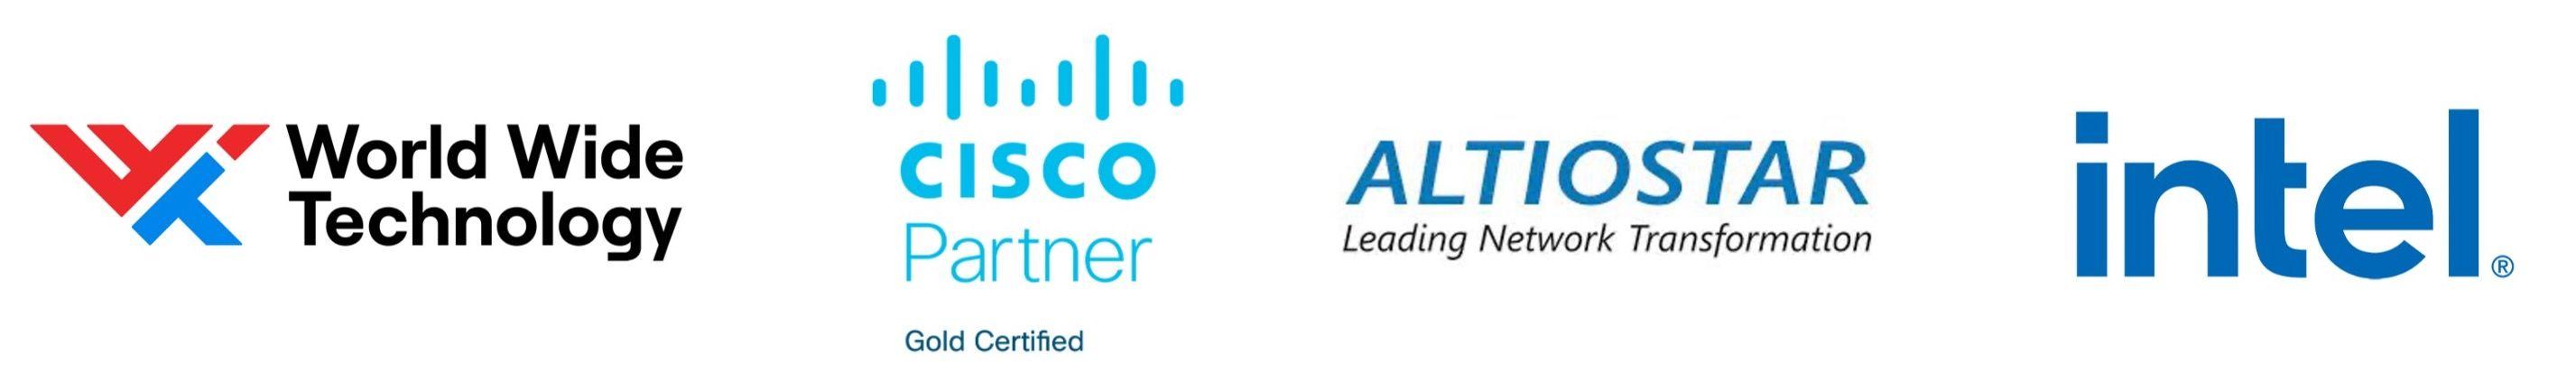 Open RAN partners WWT, Cisco, Altiostar and Intel